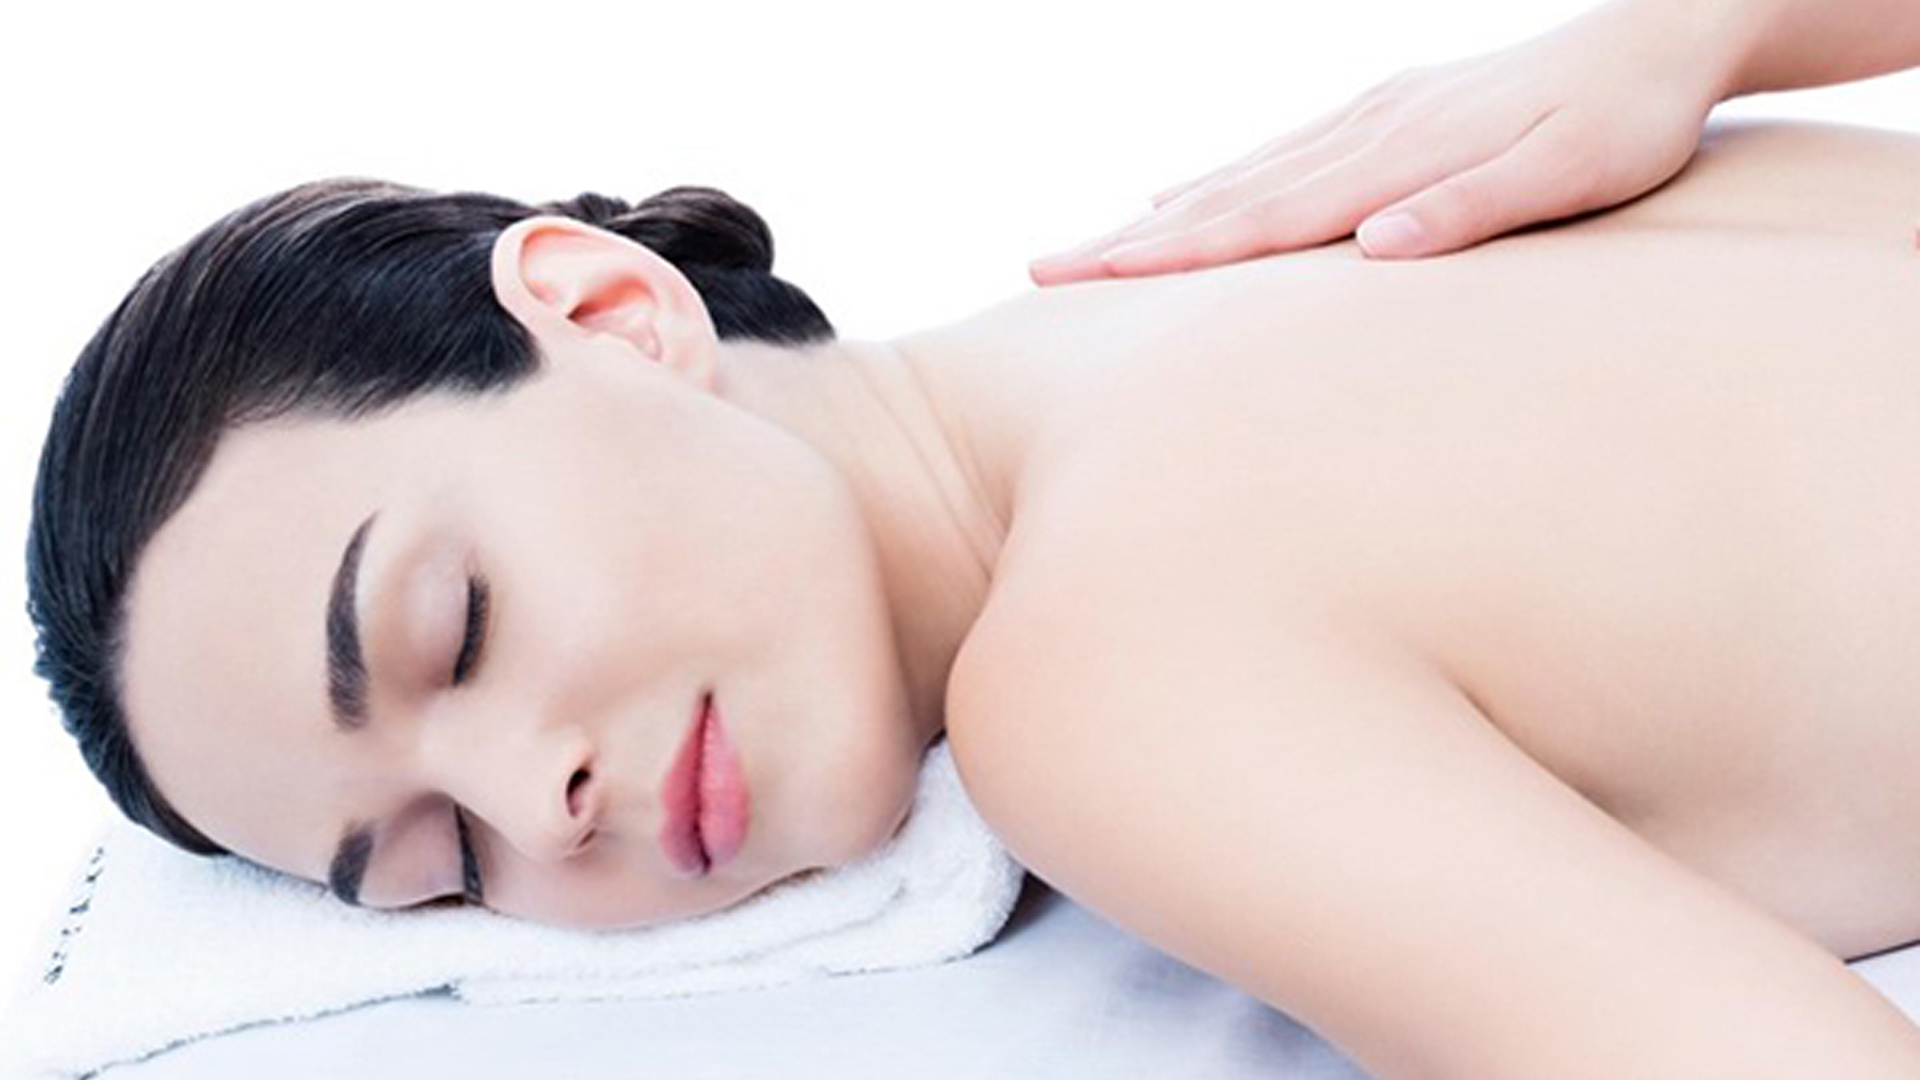 Lichaamsverzorging/massages